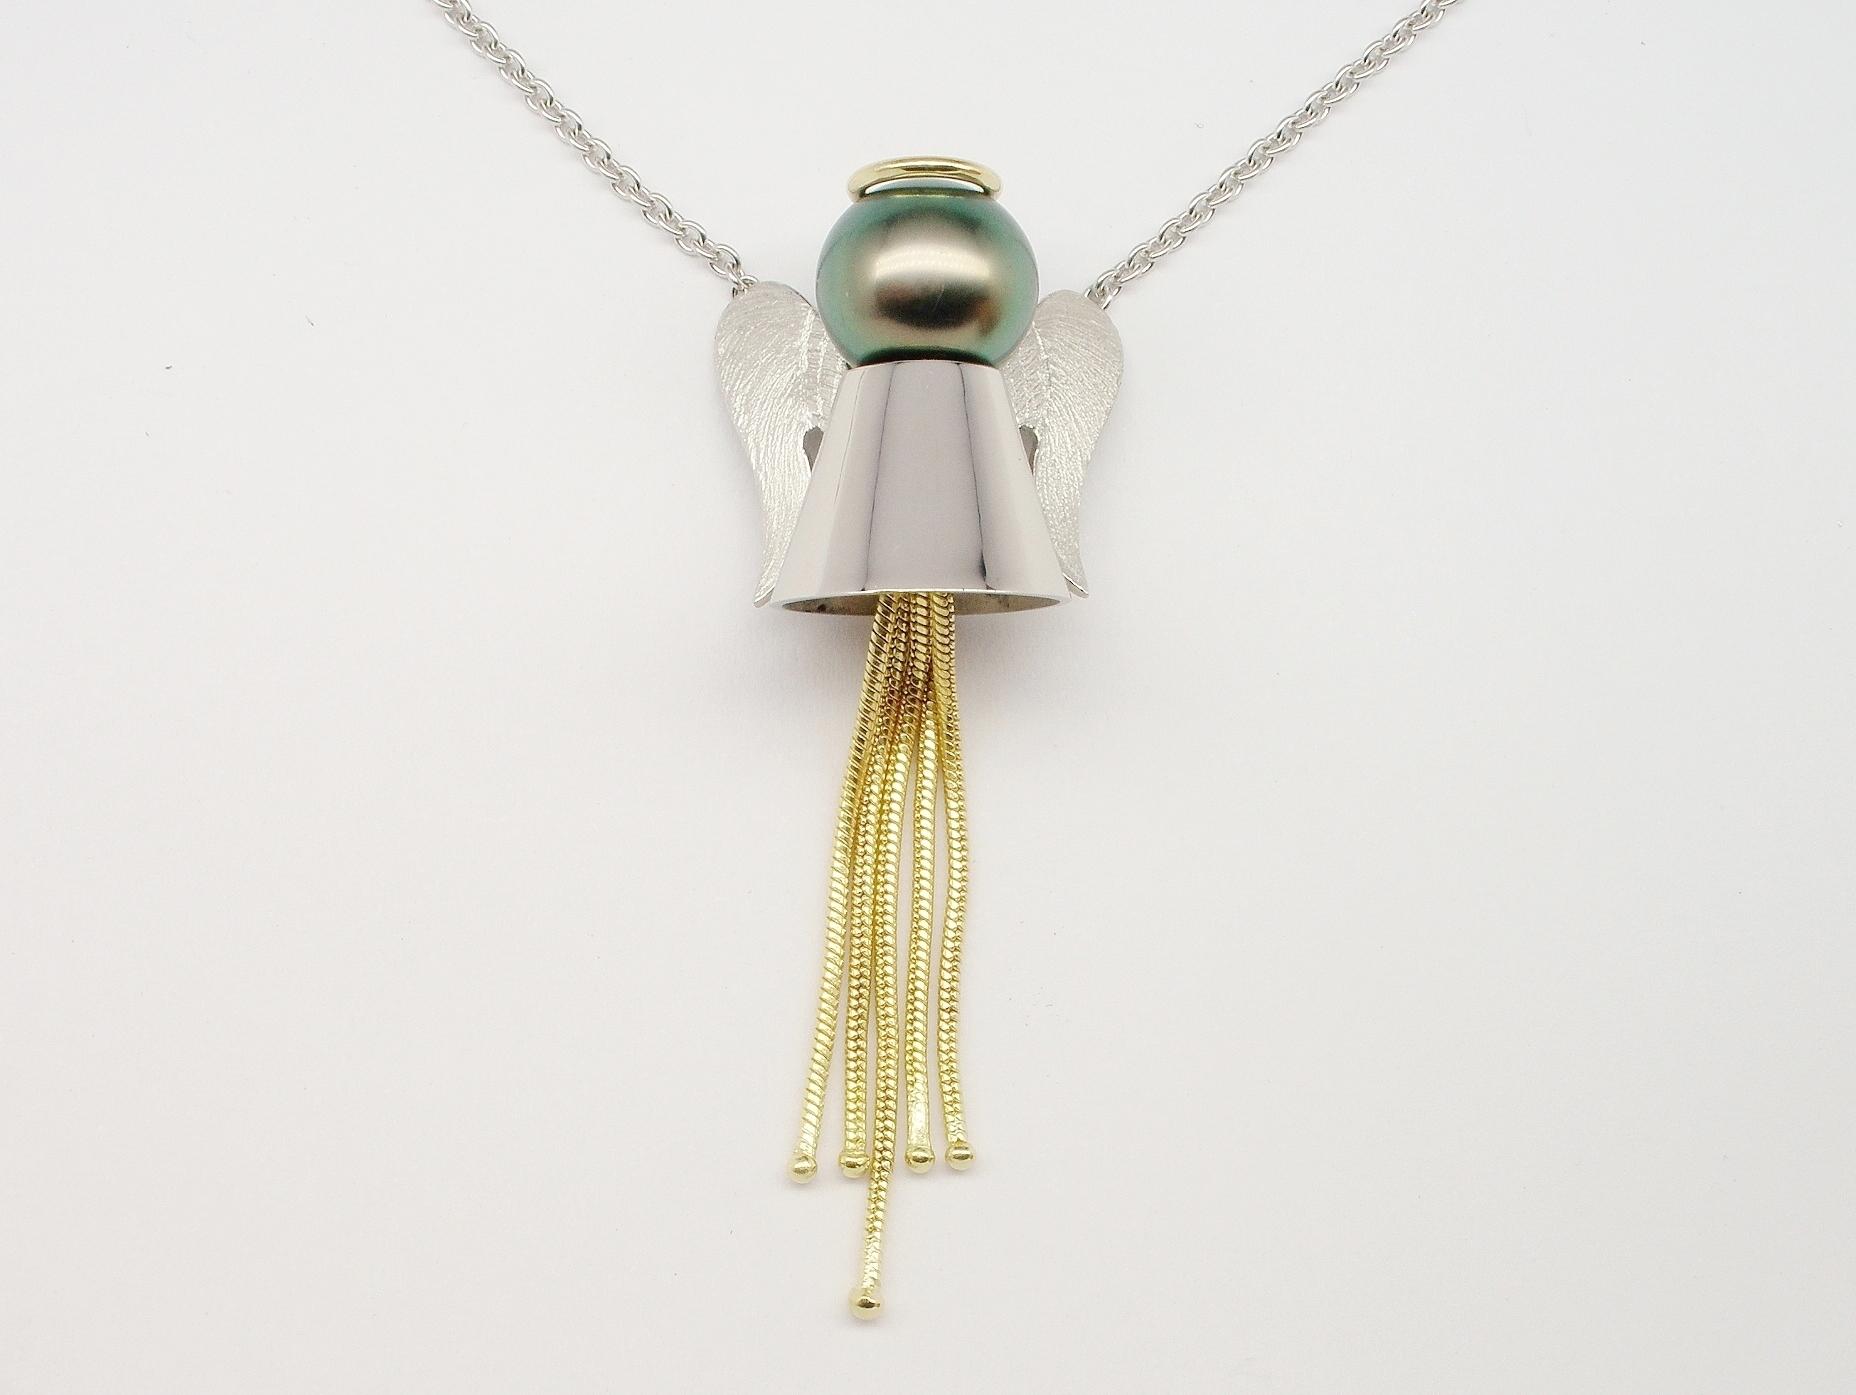 Black Tahitian pearl 'Angel' pendant mounted in palladium and 18ct. yellow gold.